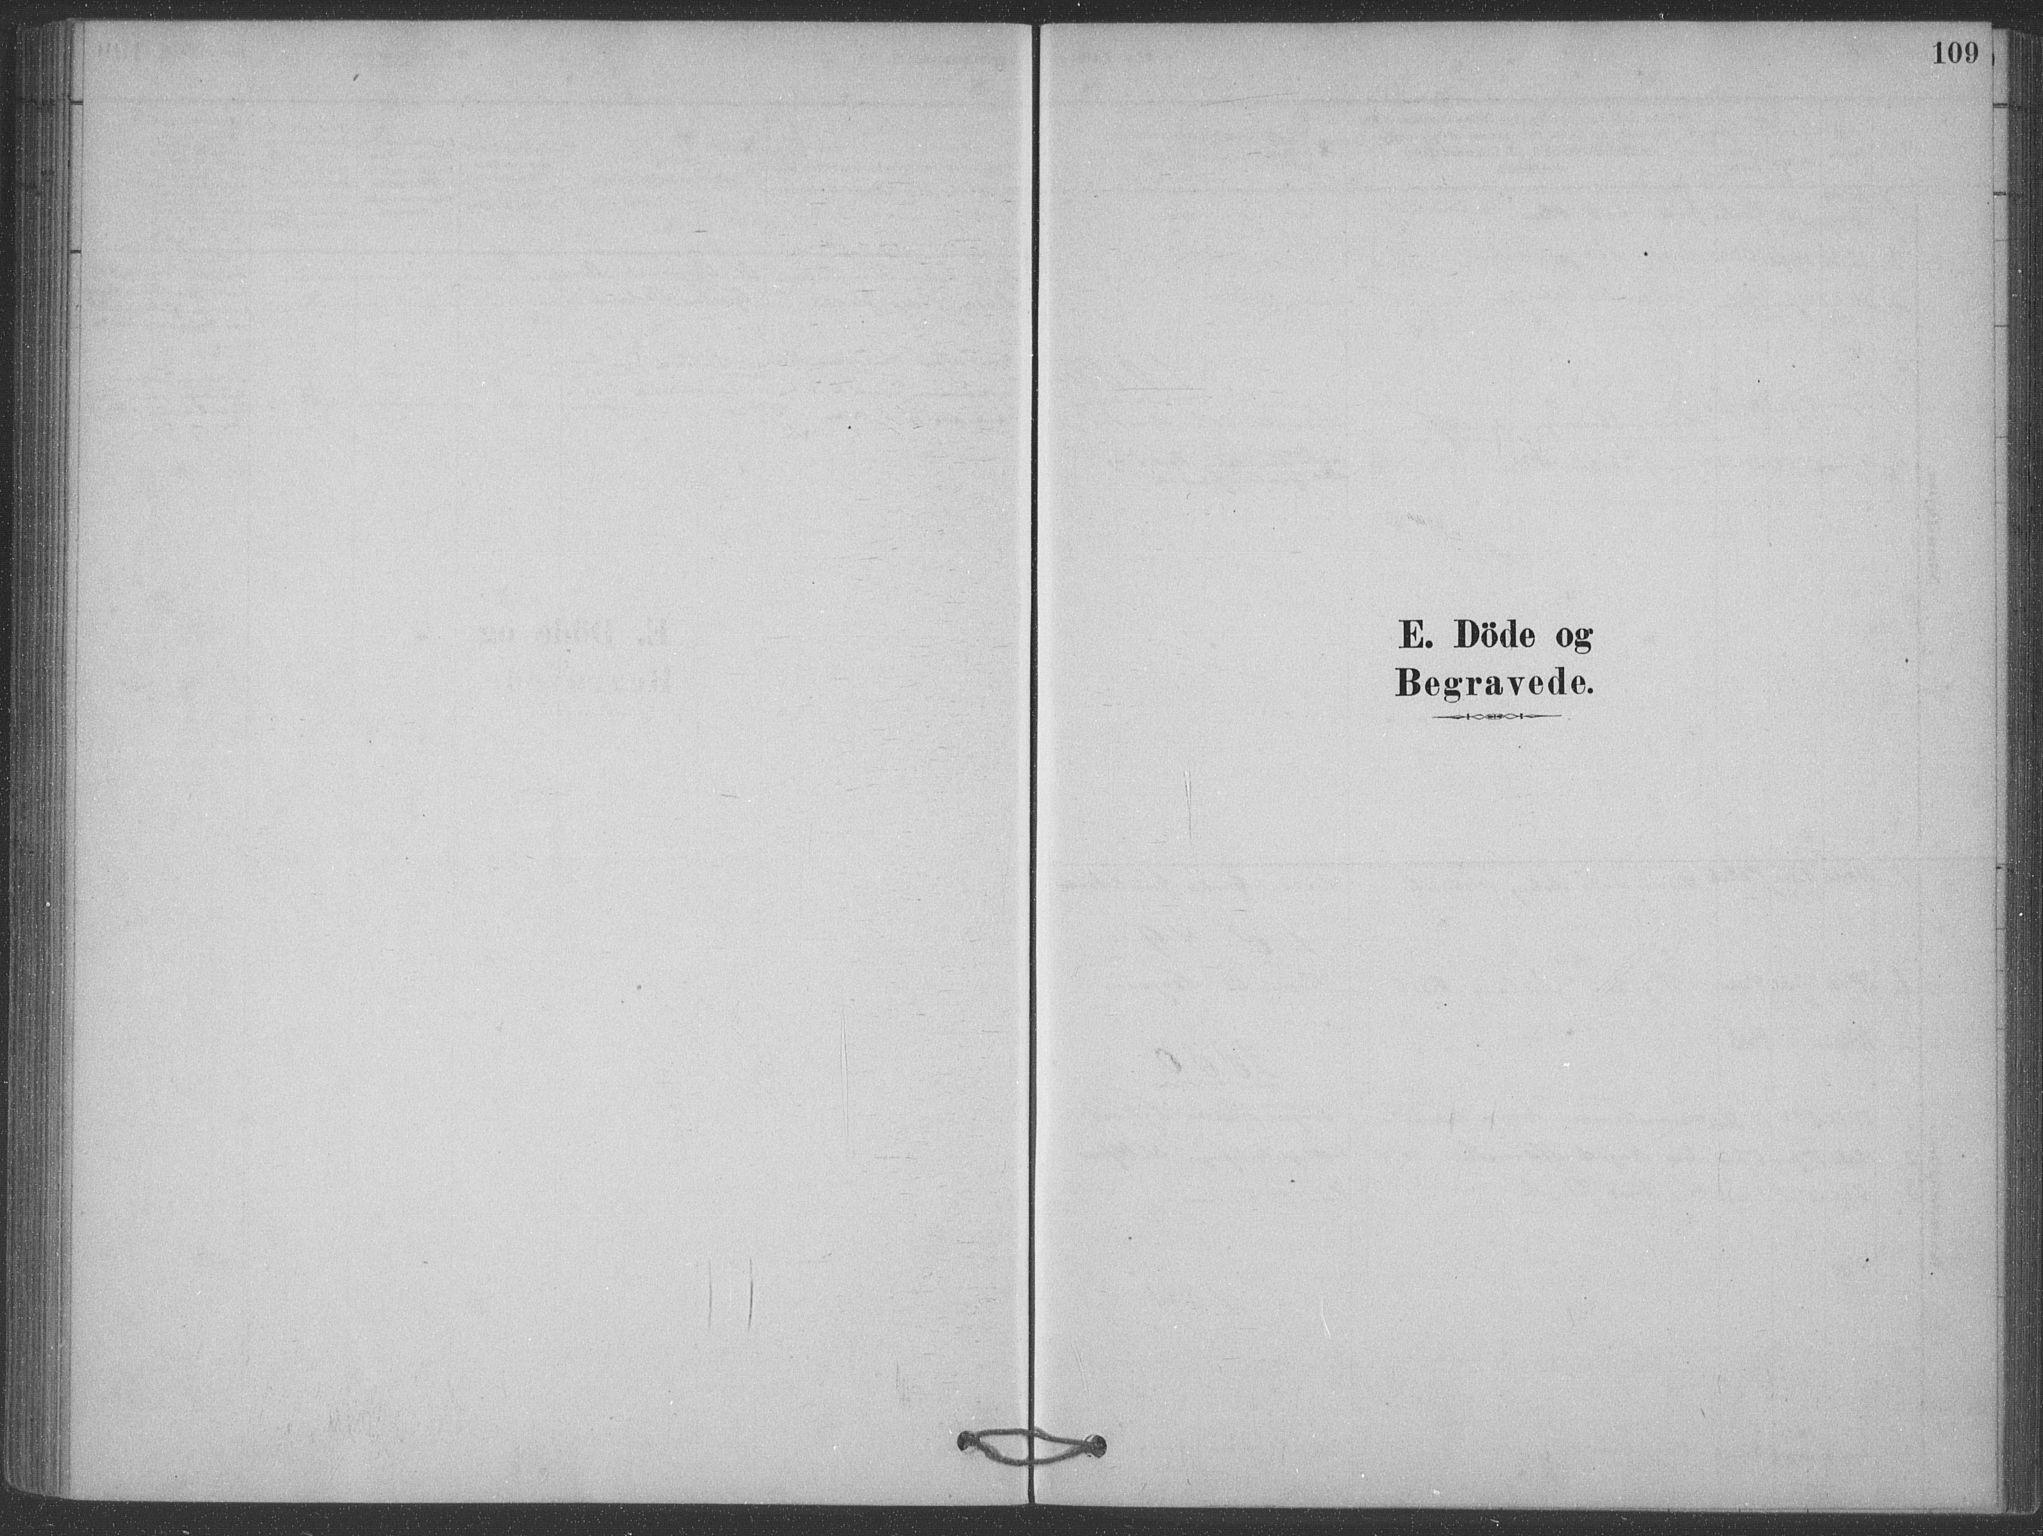 SAKO, Heddal kirkebøker, F/Fb/L0002: Ministerialbok nr. II 2, 1878-1913, s. 109